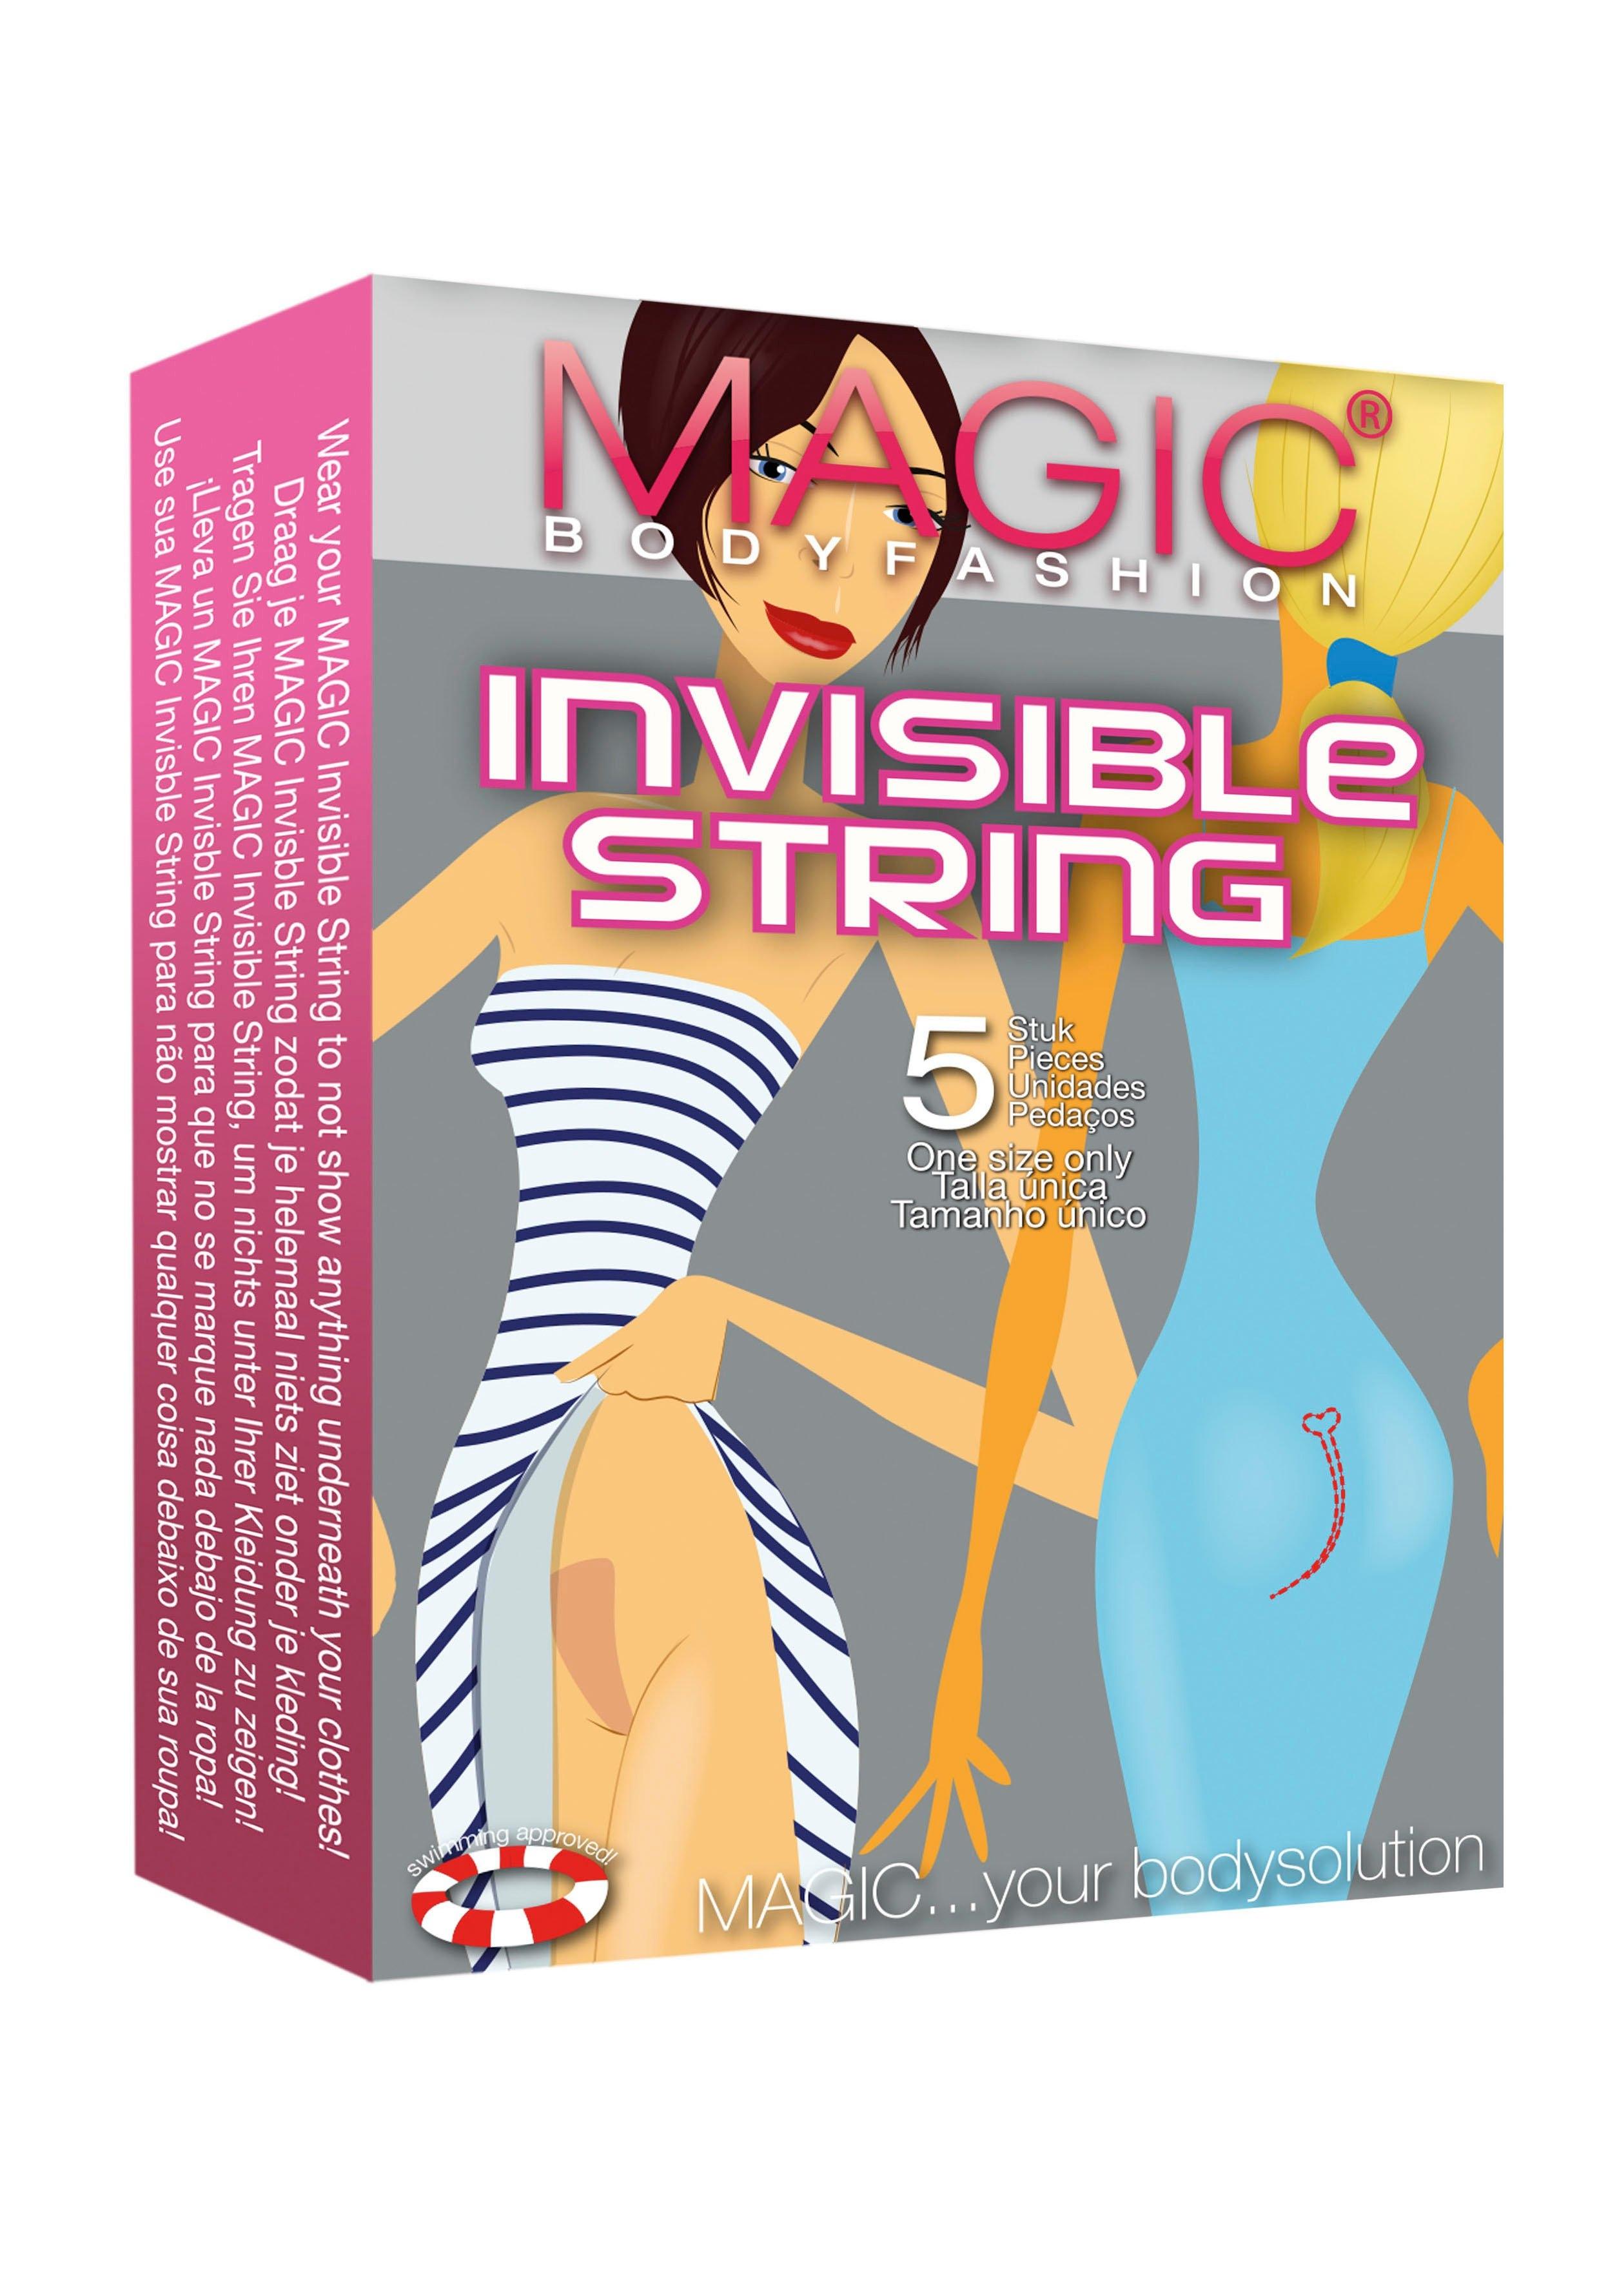 MAGIC Bodyfashion string »Invisible String« bij OTTO online kopen